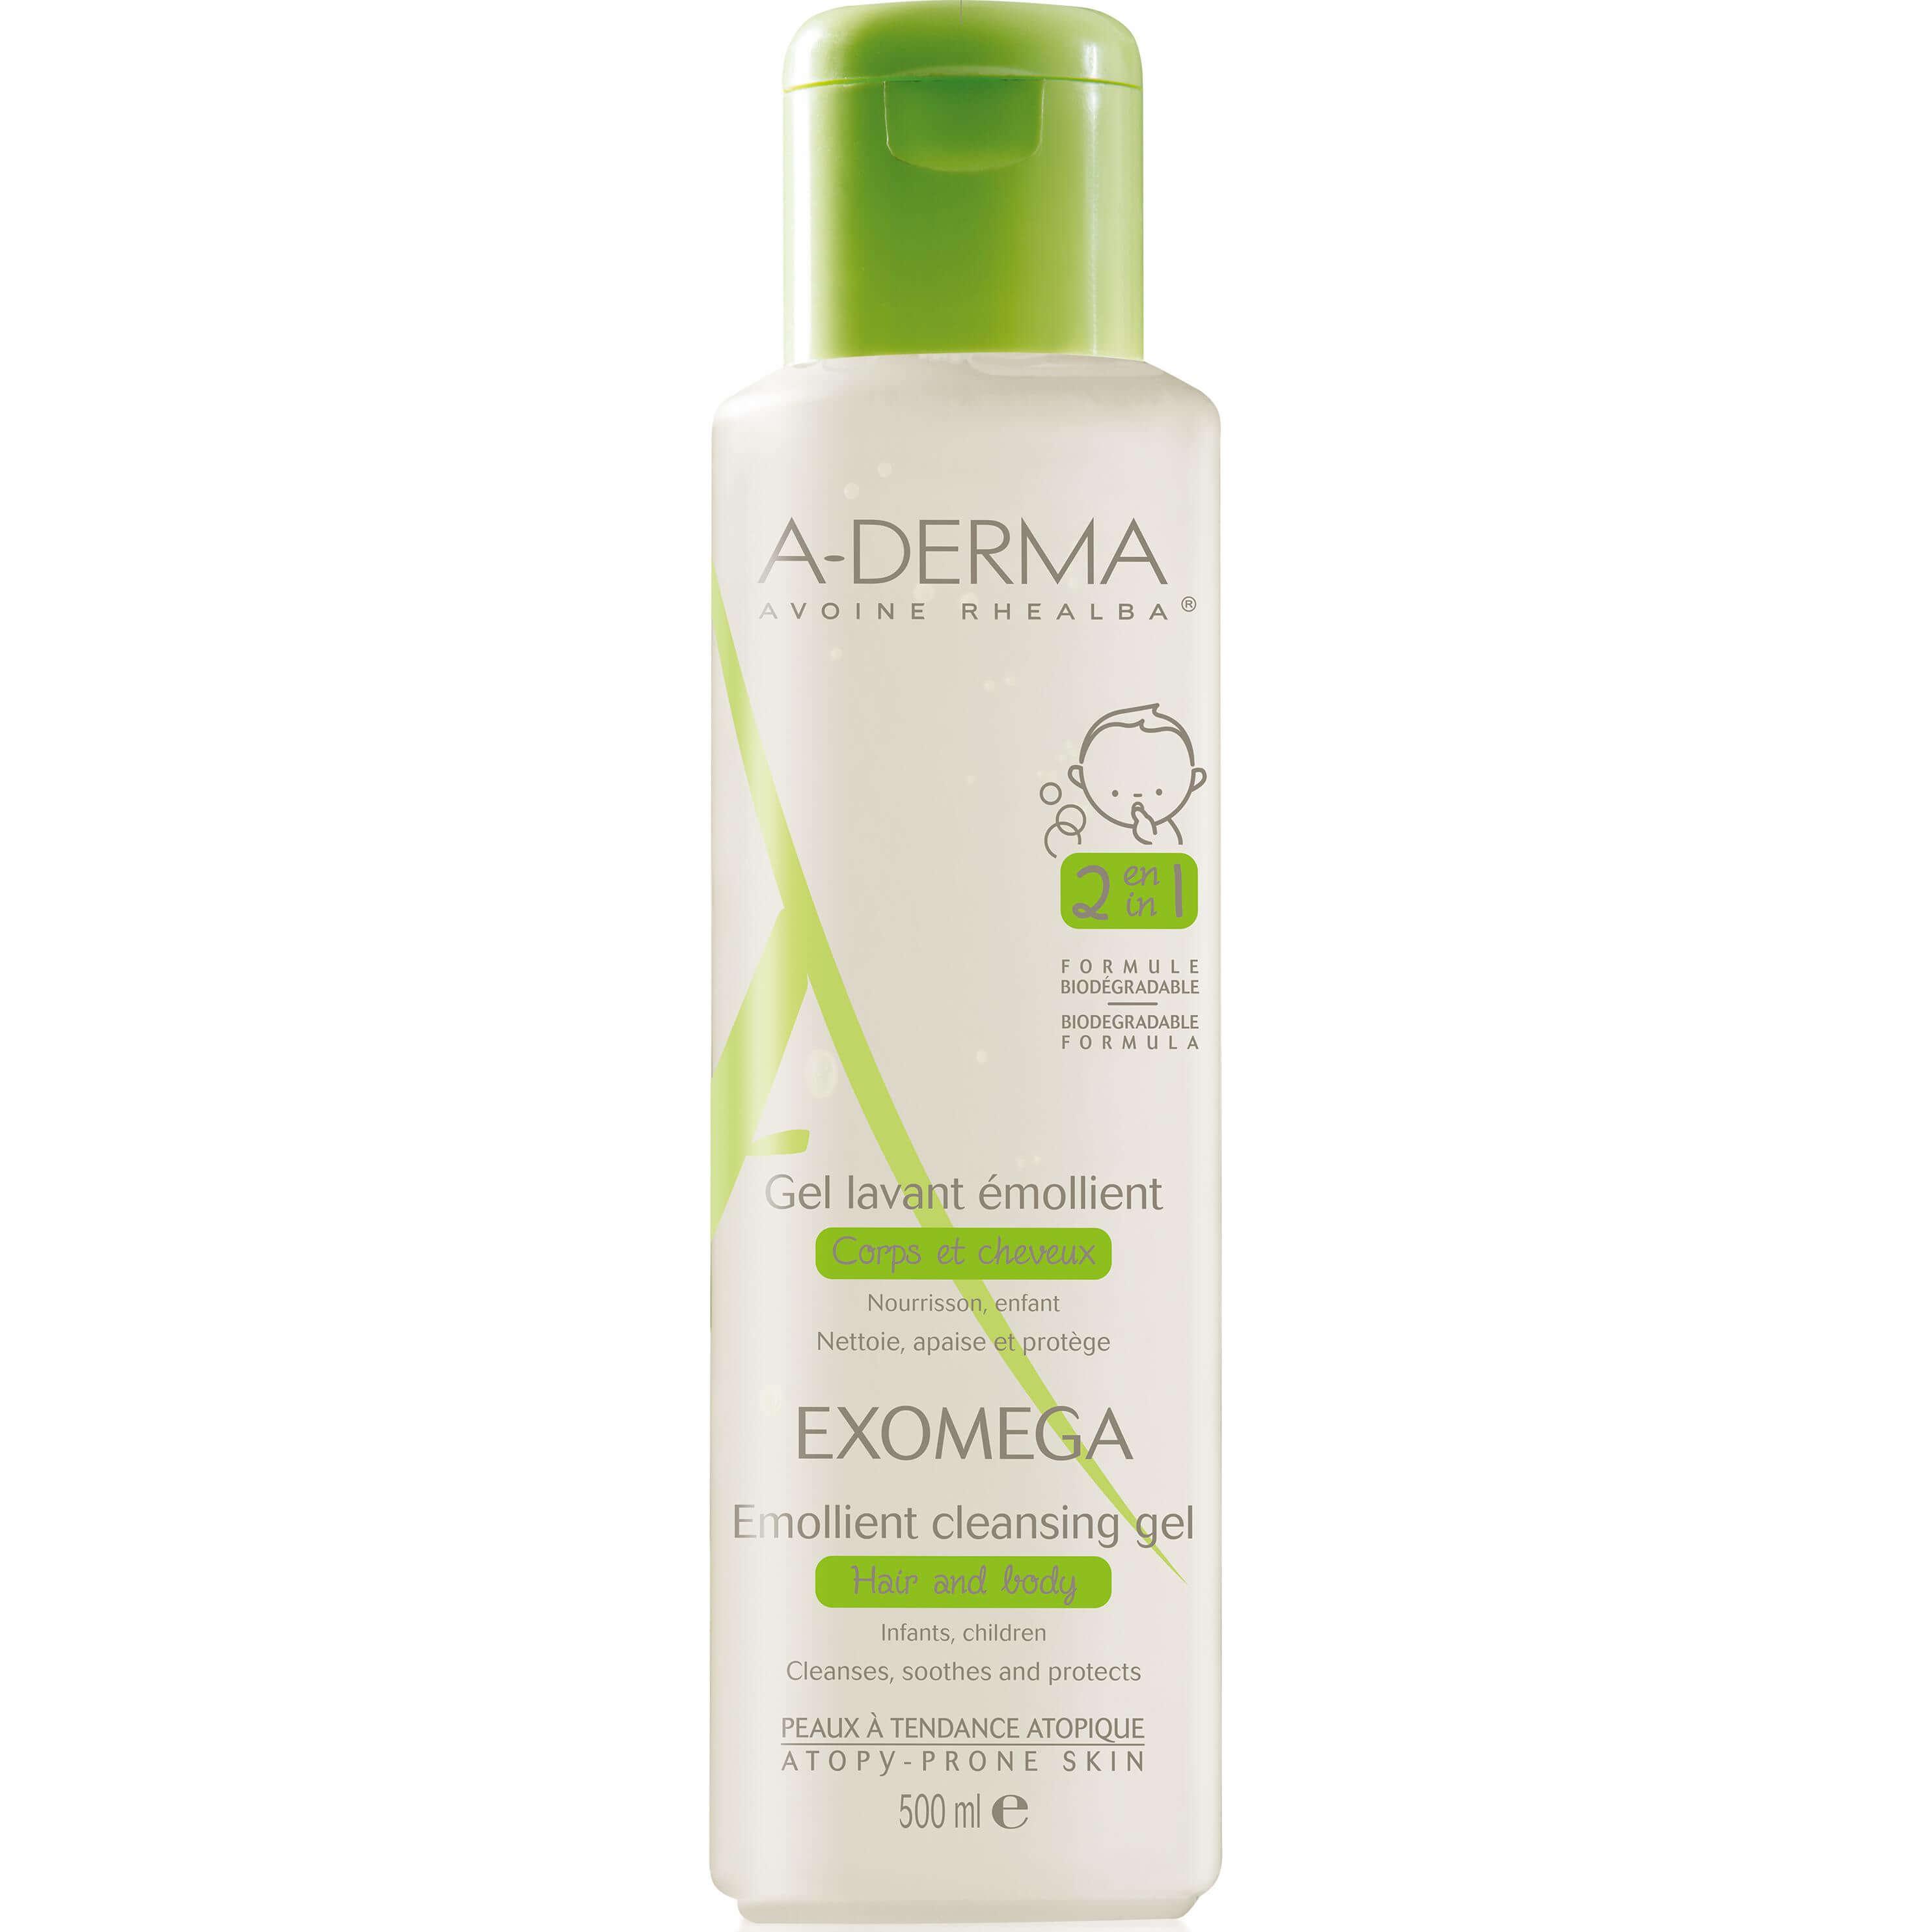 A-Derma Exomega Gel Lavant Emollient Μαλακτικό Gel Καθαρισμού για το Ατοπικό – Πολύ Ξηρό Δέρμα – Μαλλιά, Βρέφη & Παιδιά 500ml